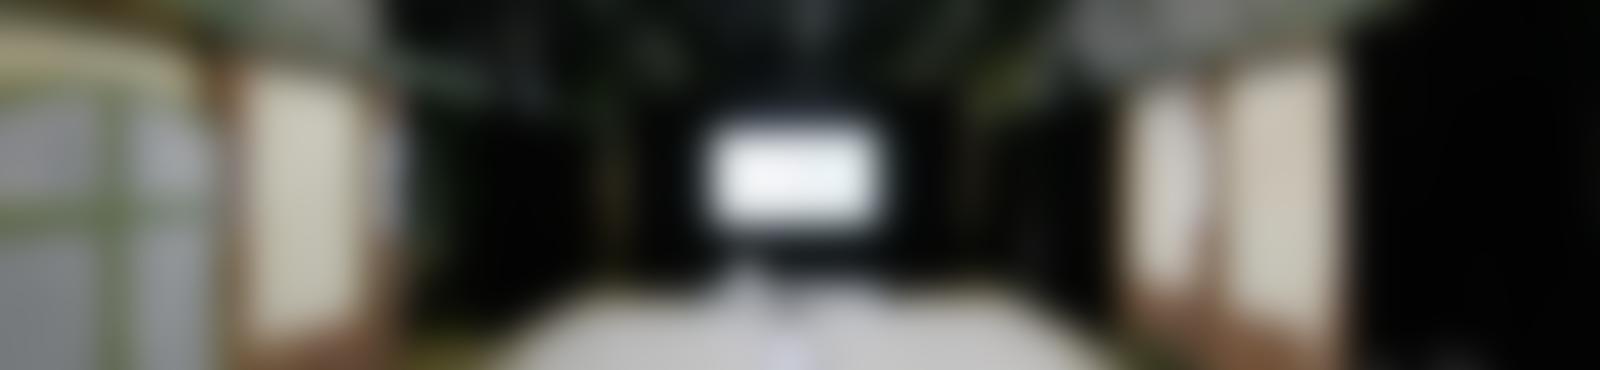 Blurred 52bdbed2 58f0 4dd3 ac52 7d296cc31789